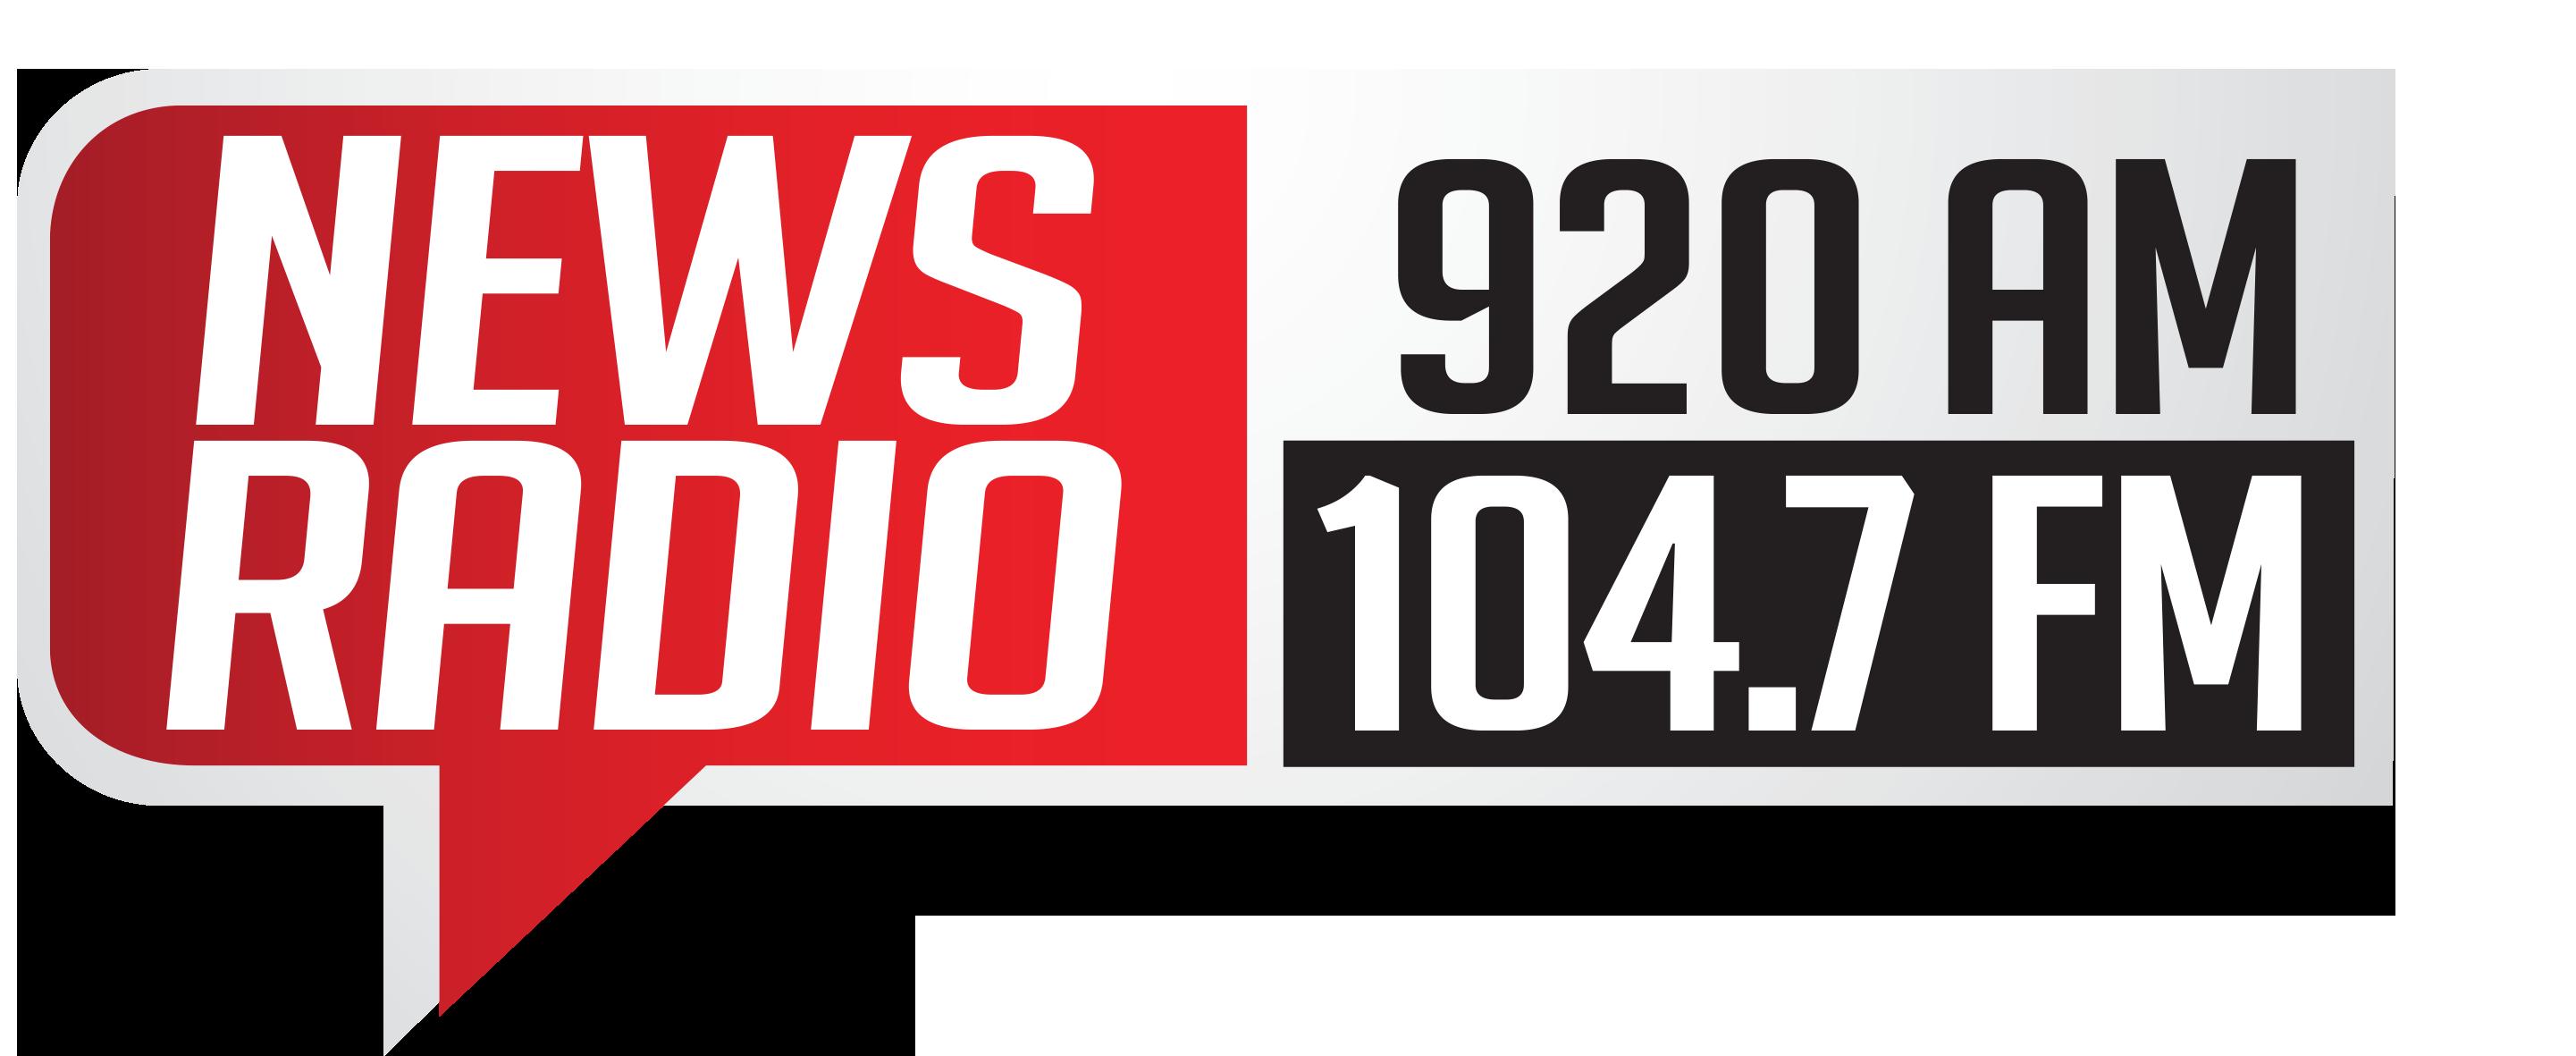 Listen to the WHJJ Clips Episode - URI Football Coaches Show 8-29-19 on iHeartRadio   iHeartRadio